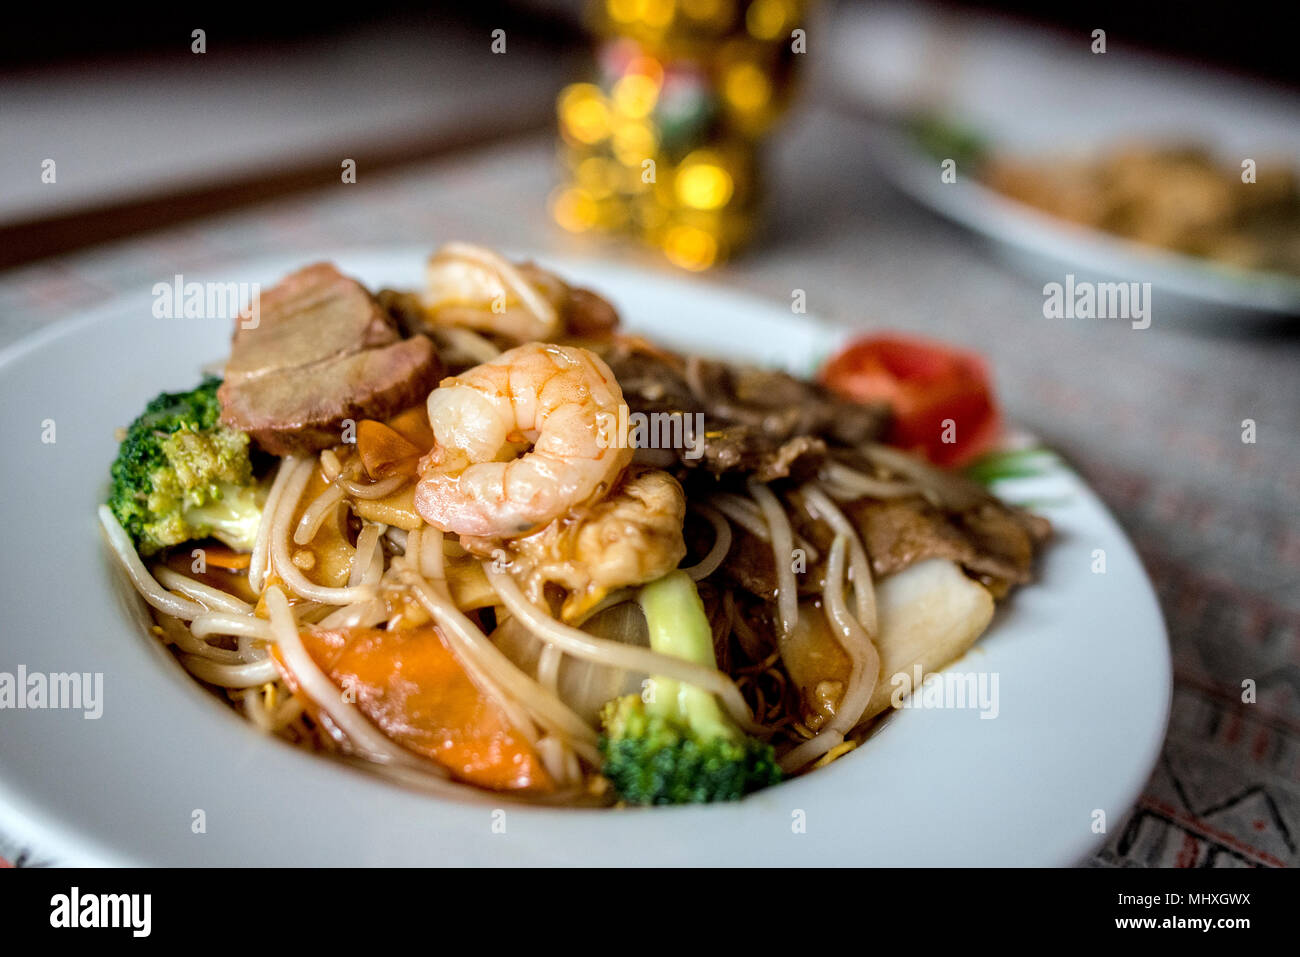 Comida China Imagen De Stock